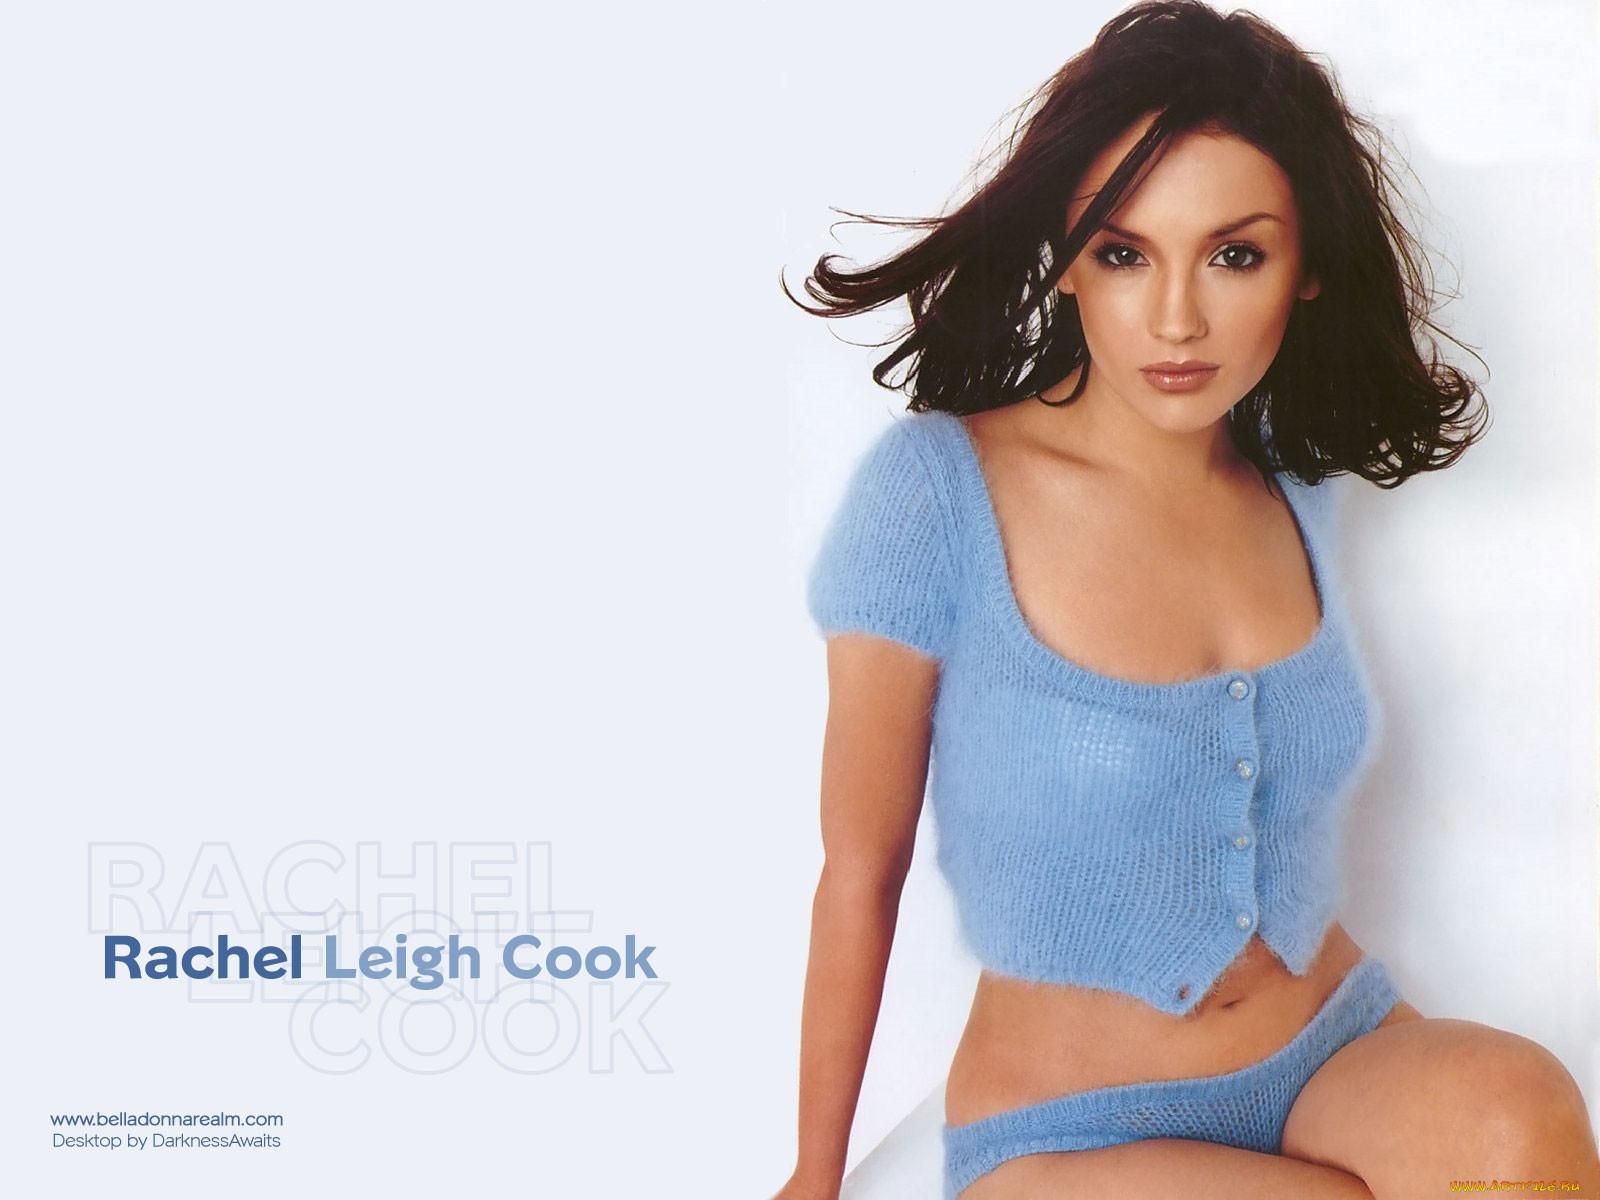 Rachael Leigh Cook Fakes